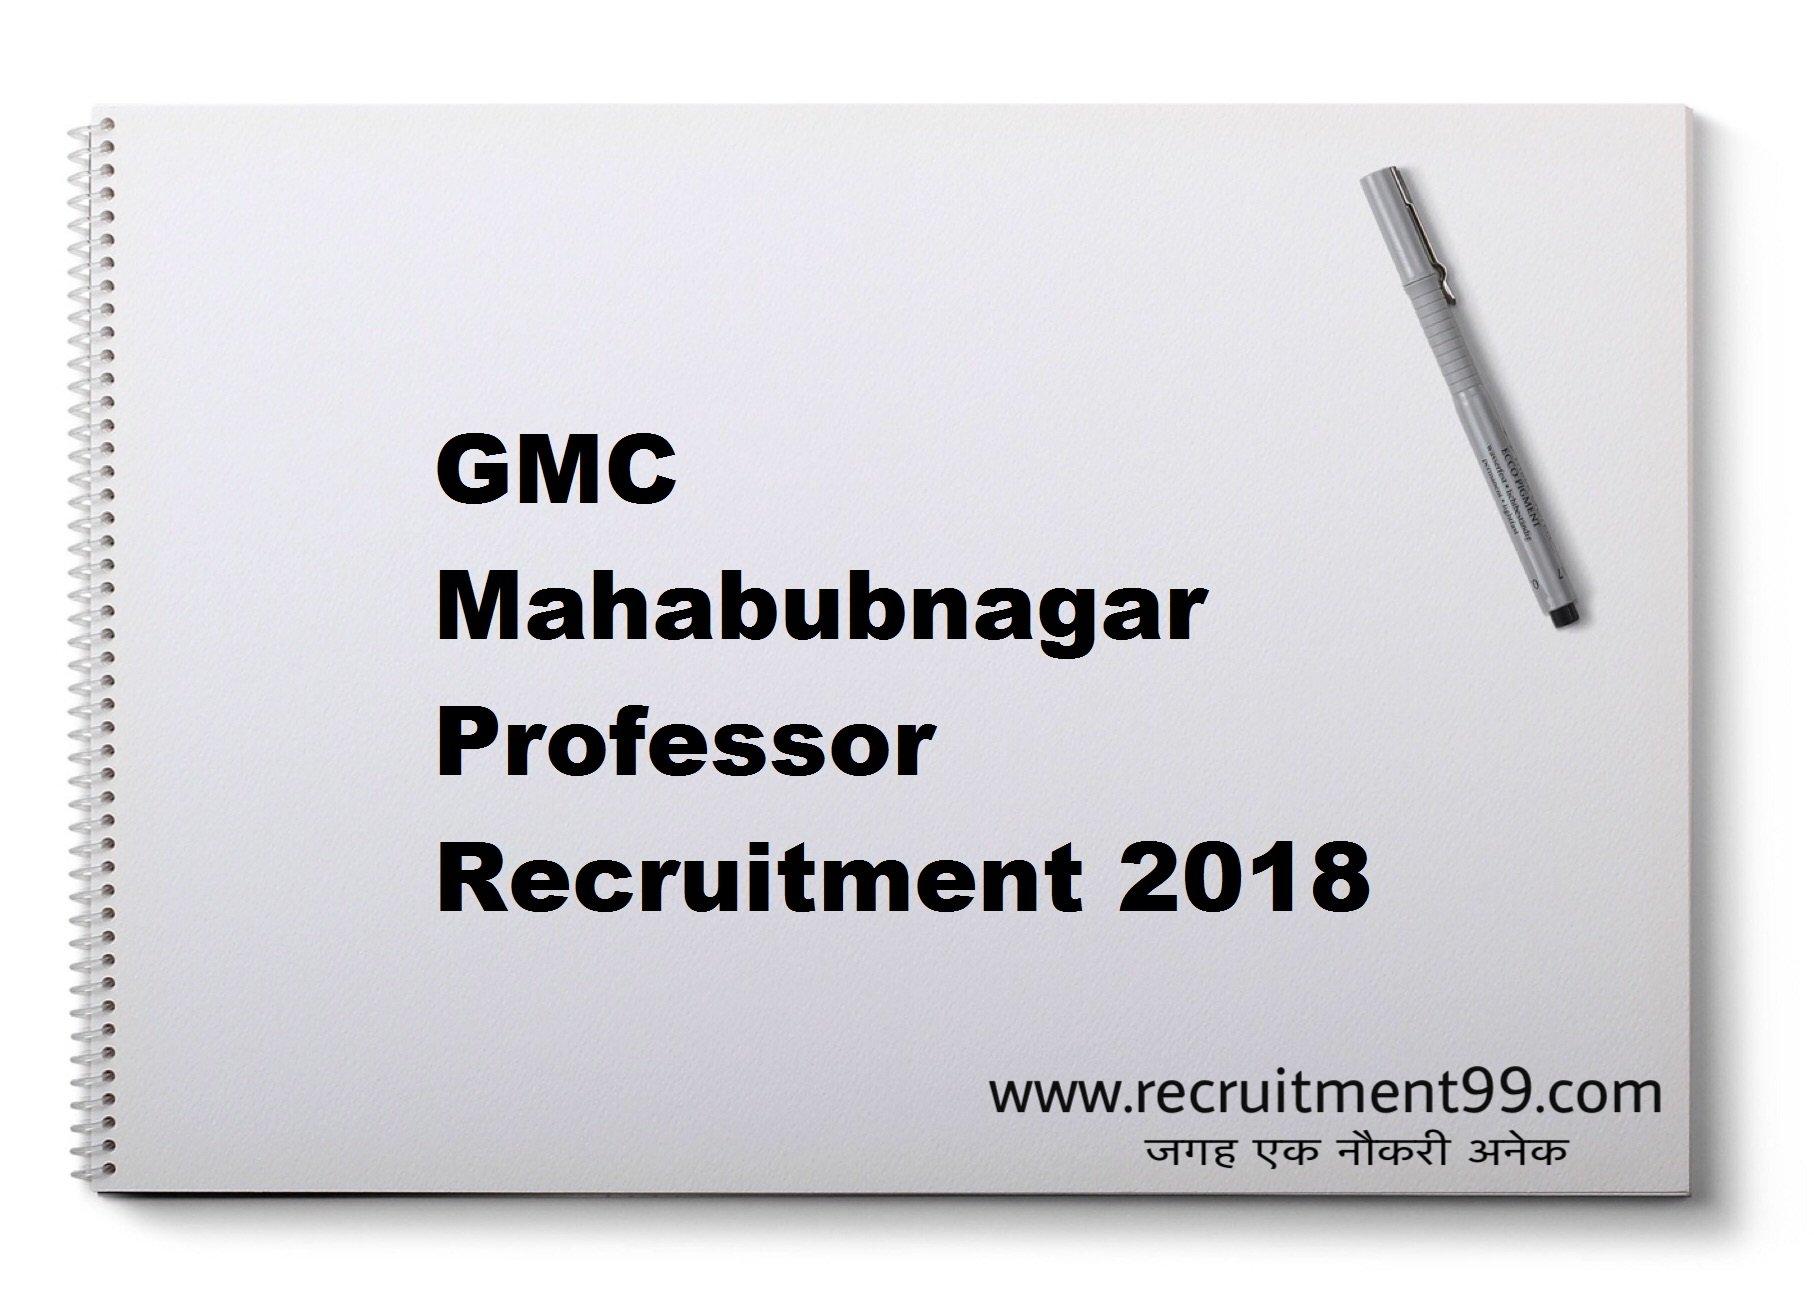 GMC Mahabubnagar Professor Recruitment Admit Card Result 2018